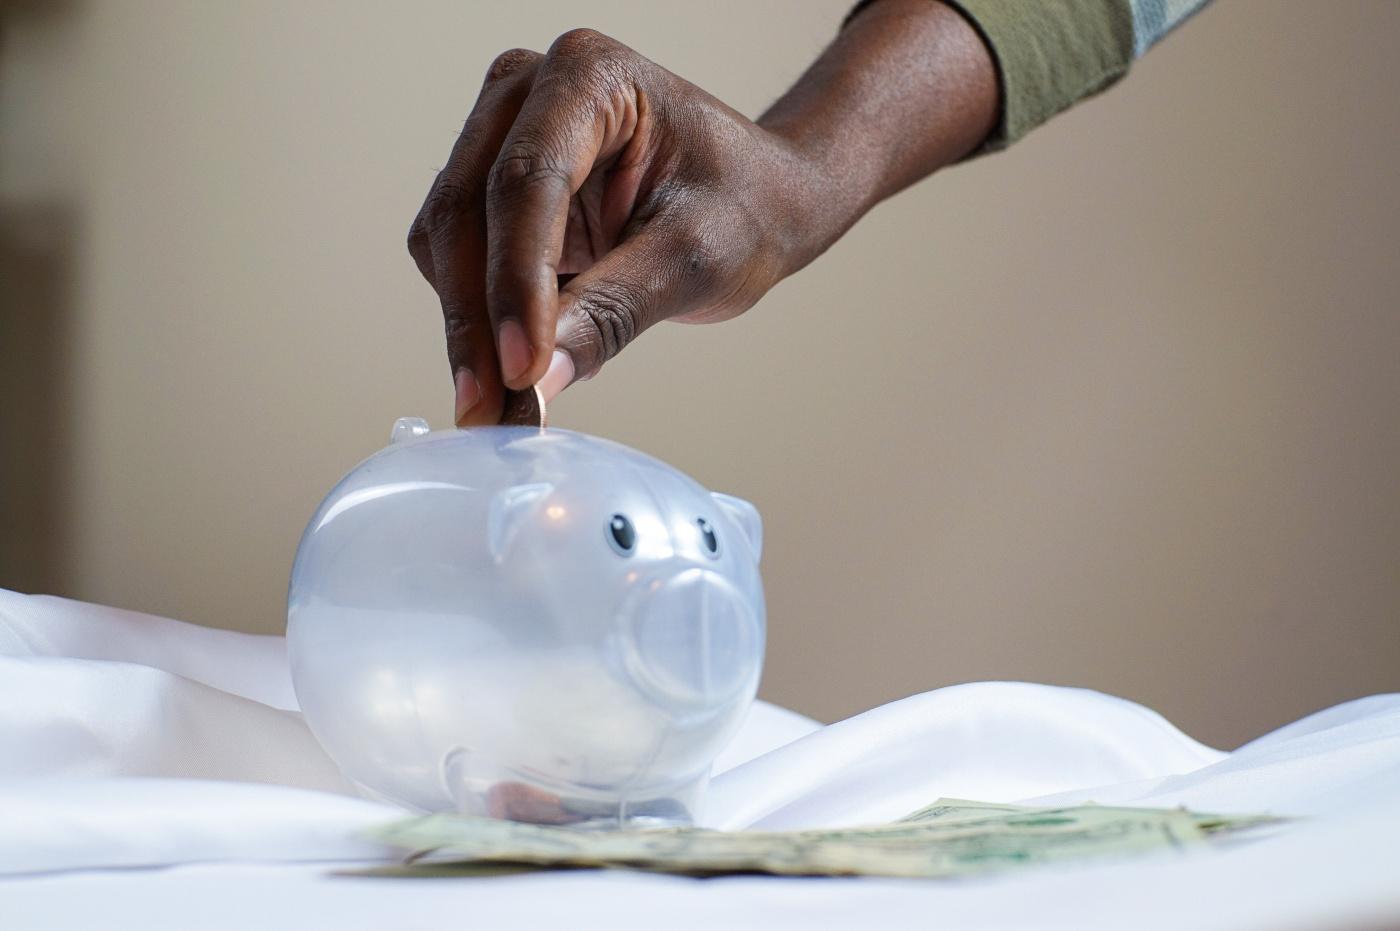 Budgeting Site 'Reel' Helps Consumers Splurge Responsibly